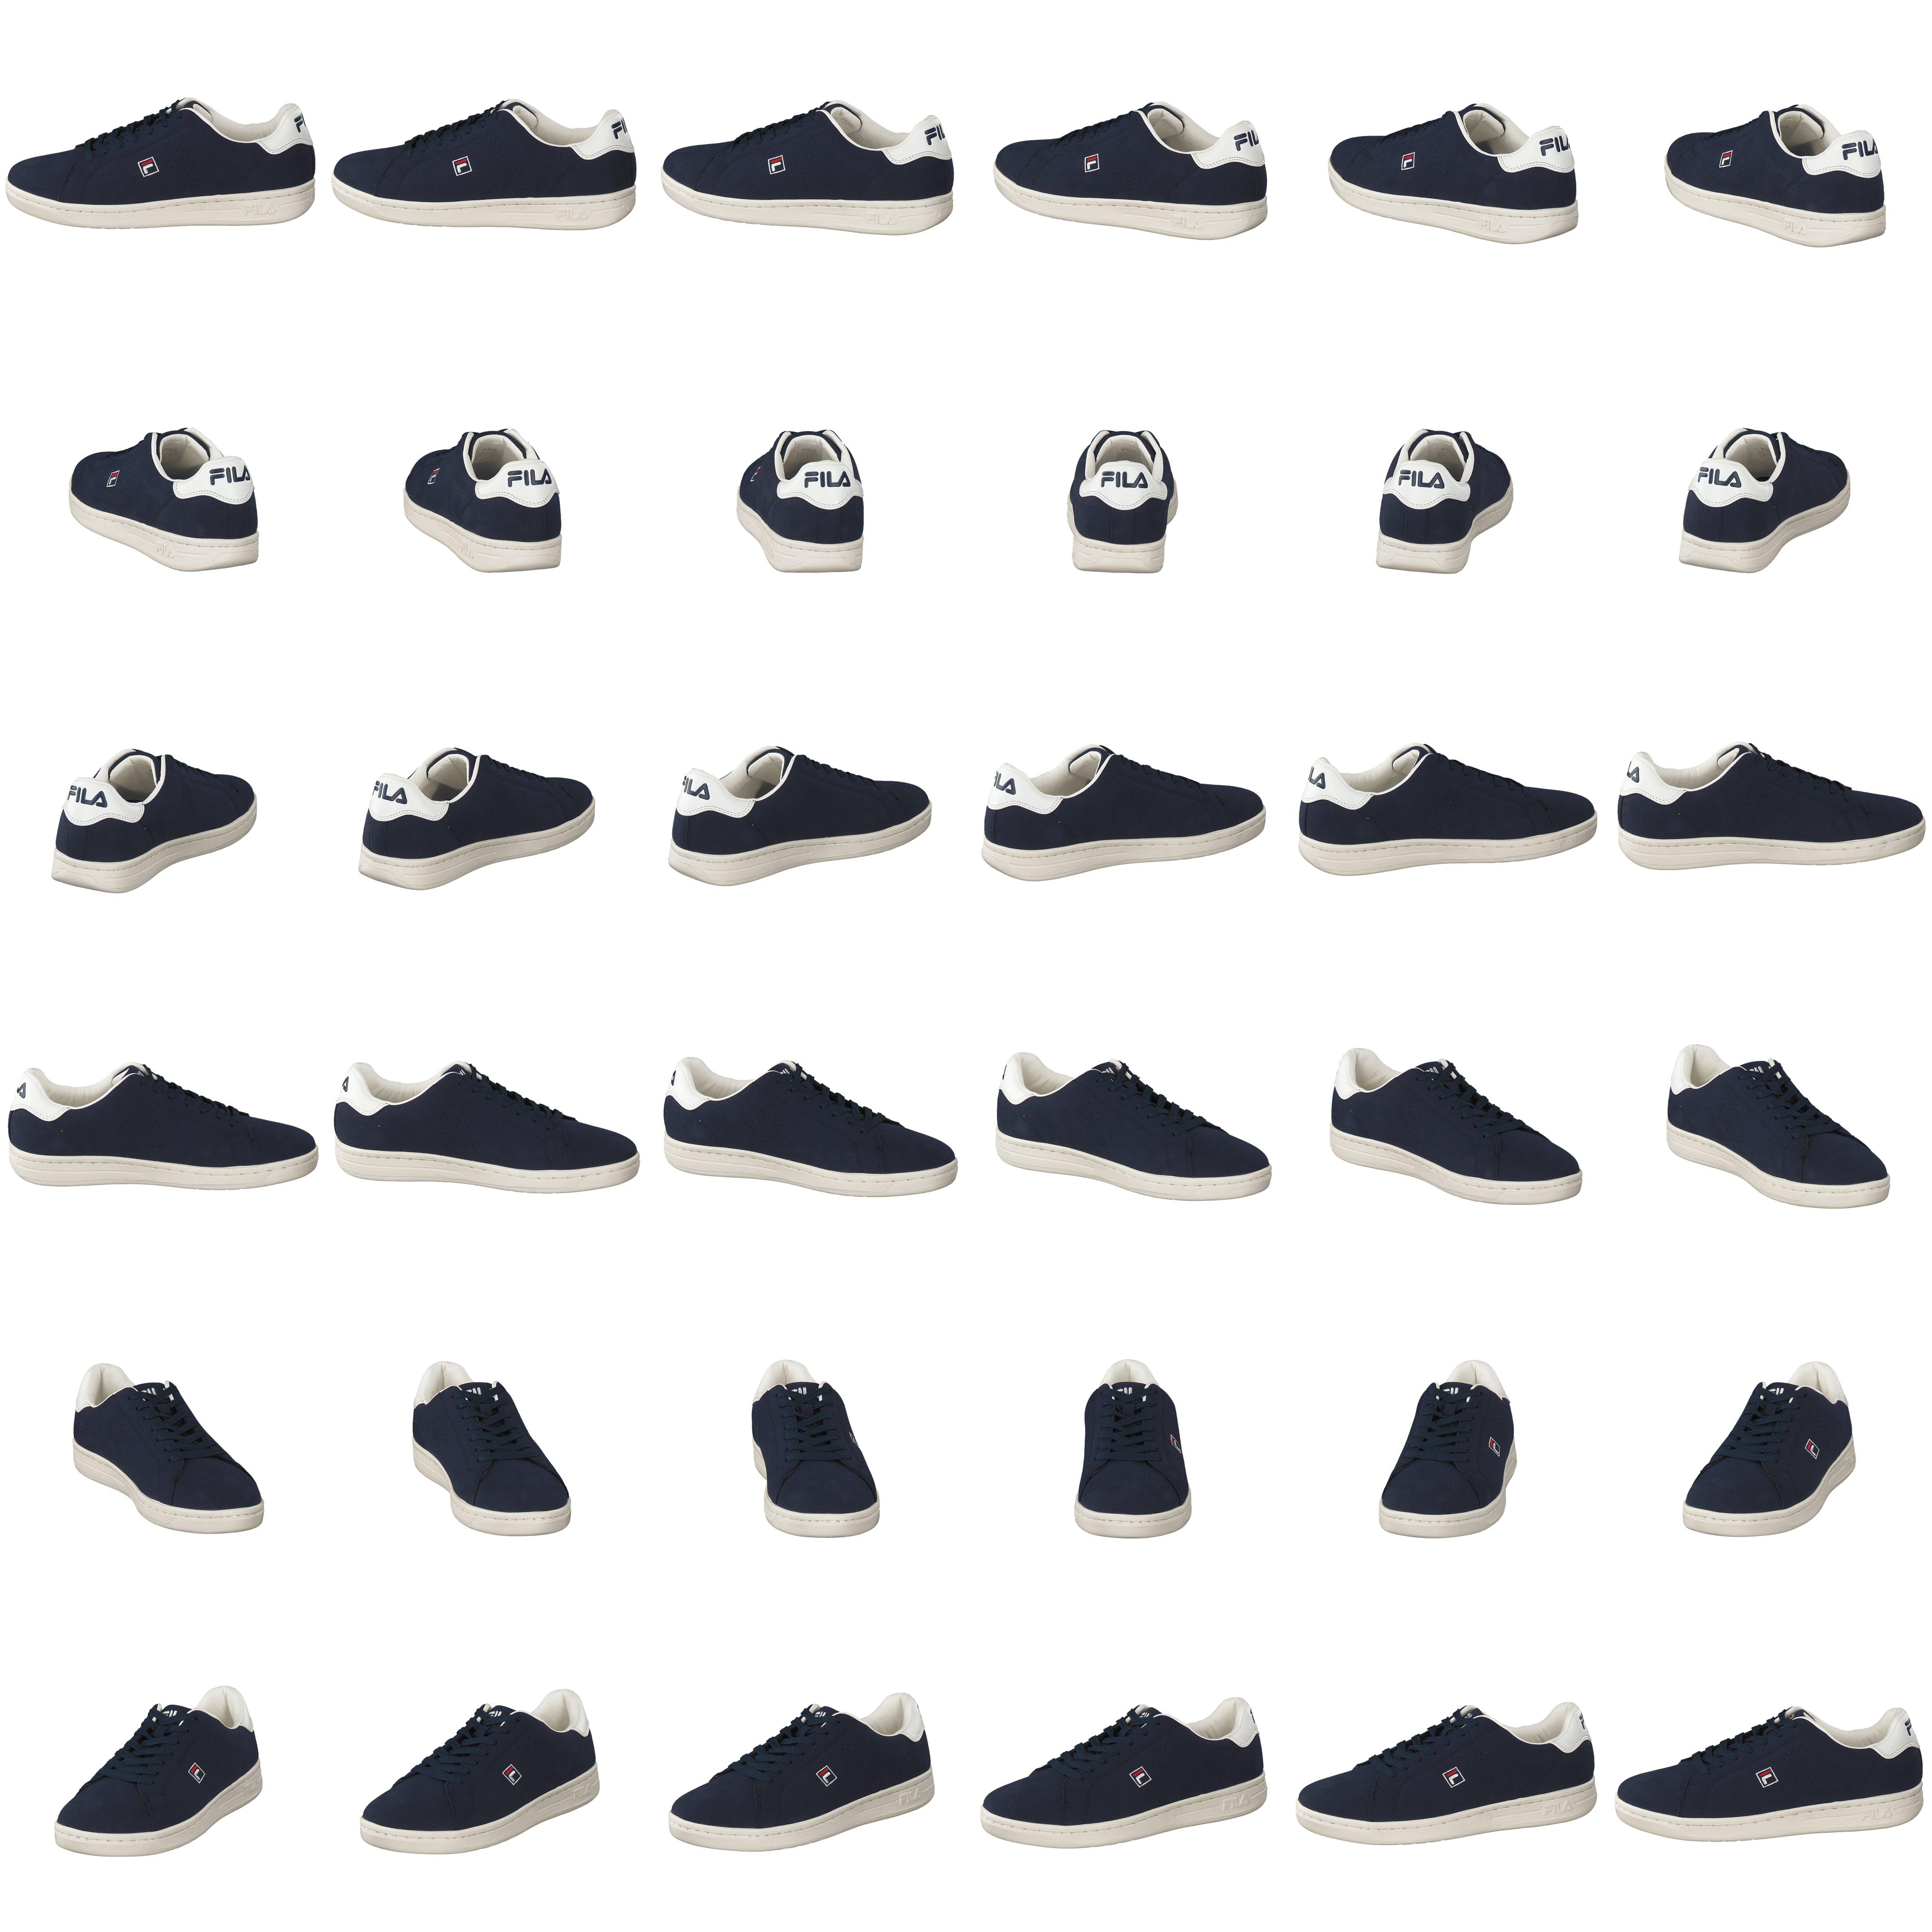 Fila Crosscourt 2 S Low Dress Blue Schuhe Kaufen Online